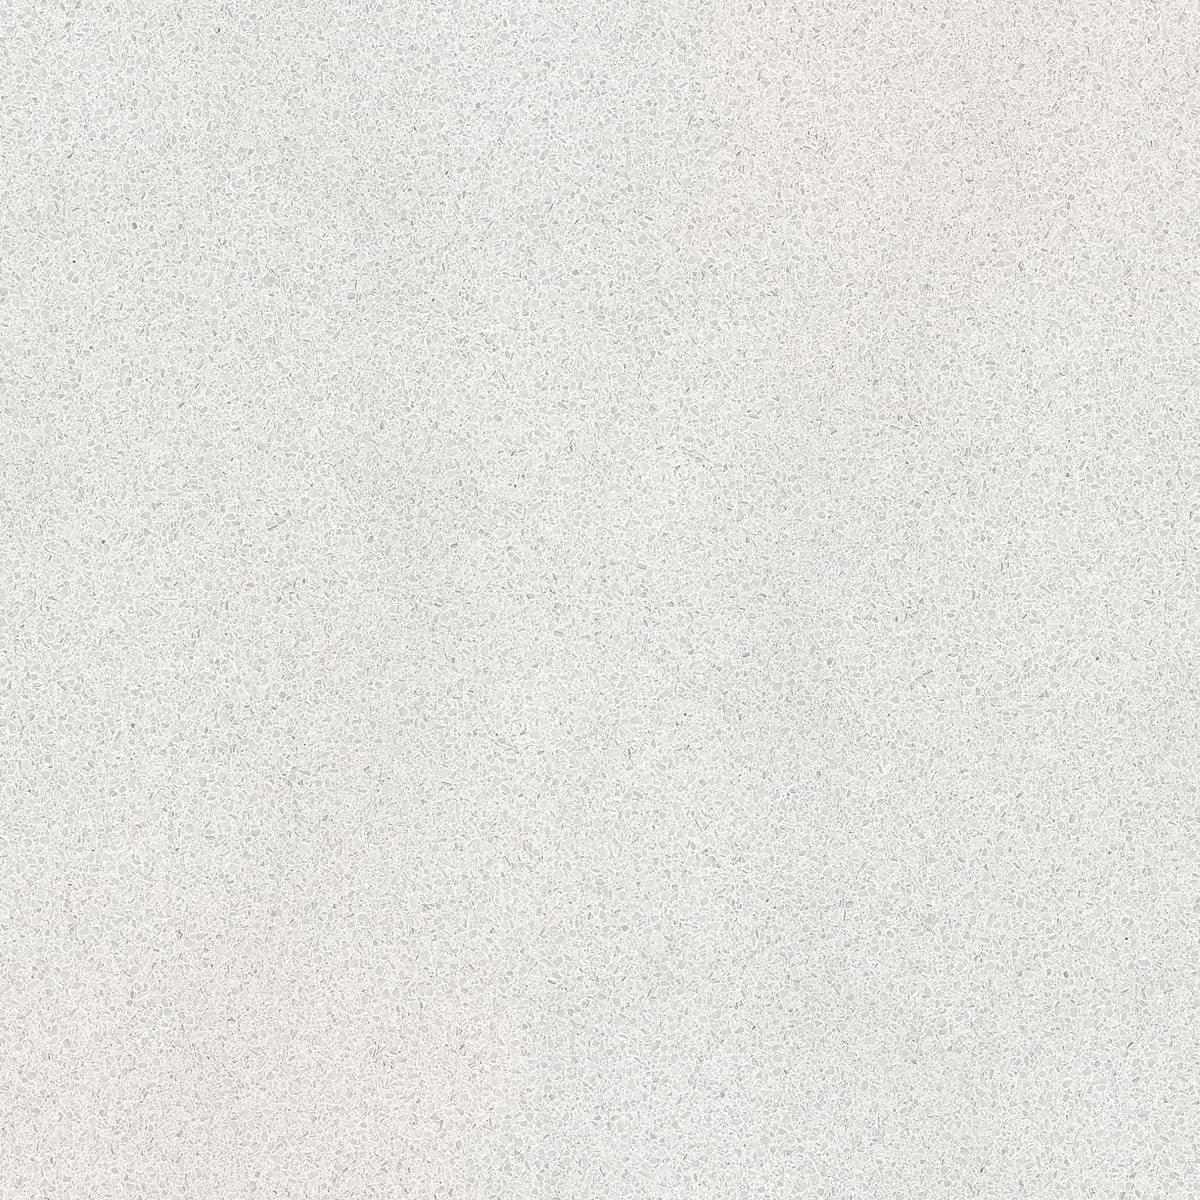 Ref 686 Bianco Reale